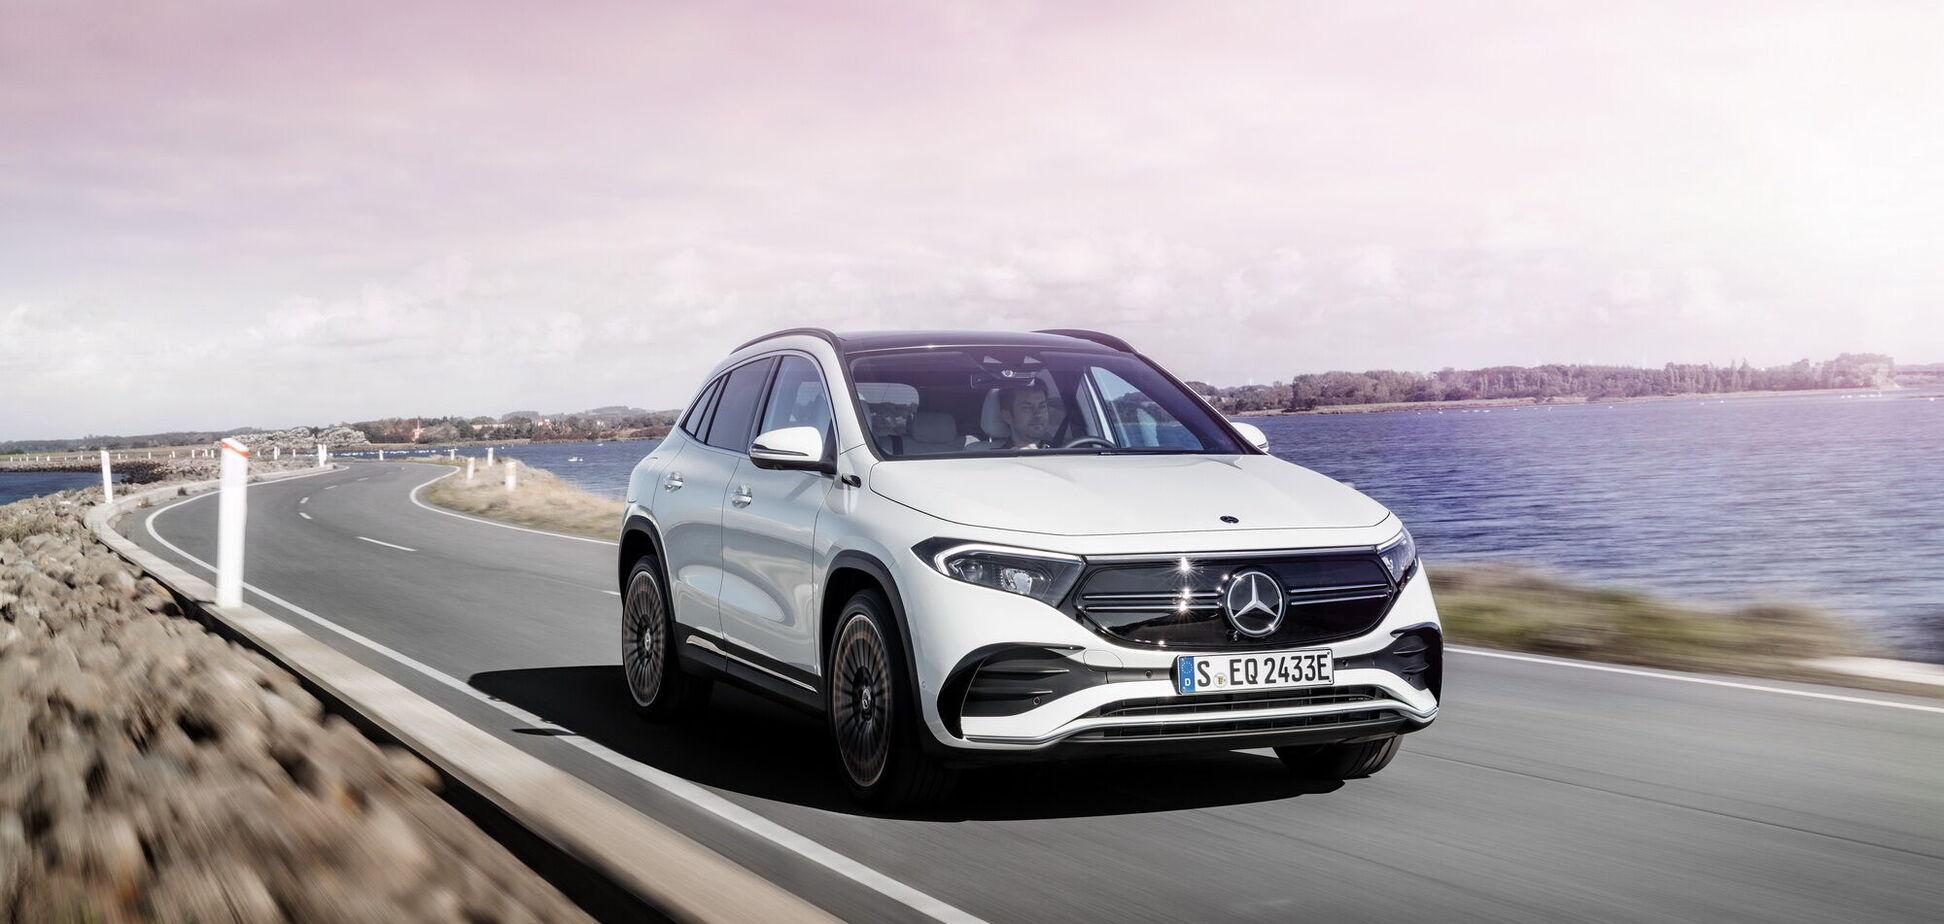 Електричний Mercedes-Benz EQA поспішає в Україну